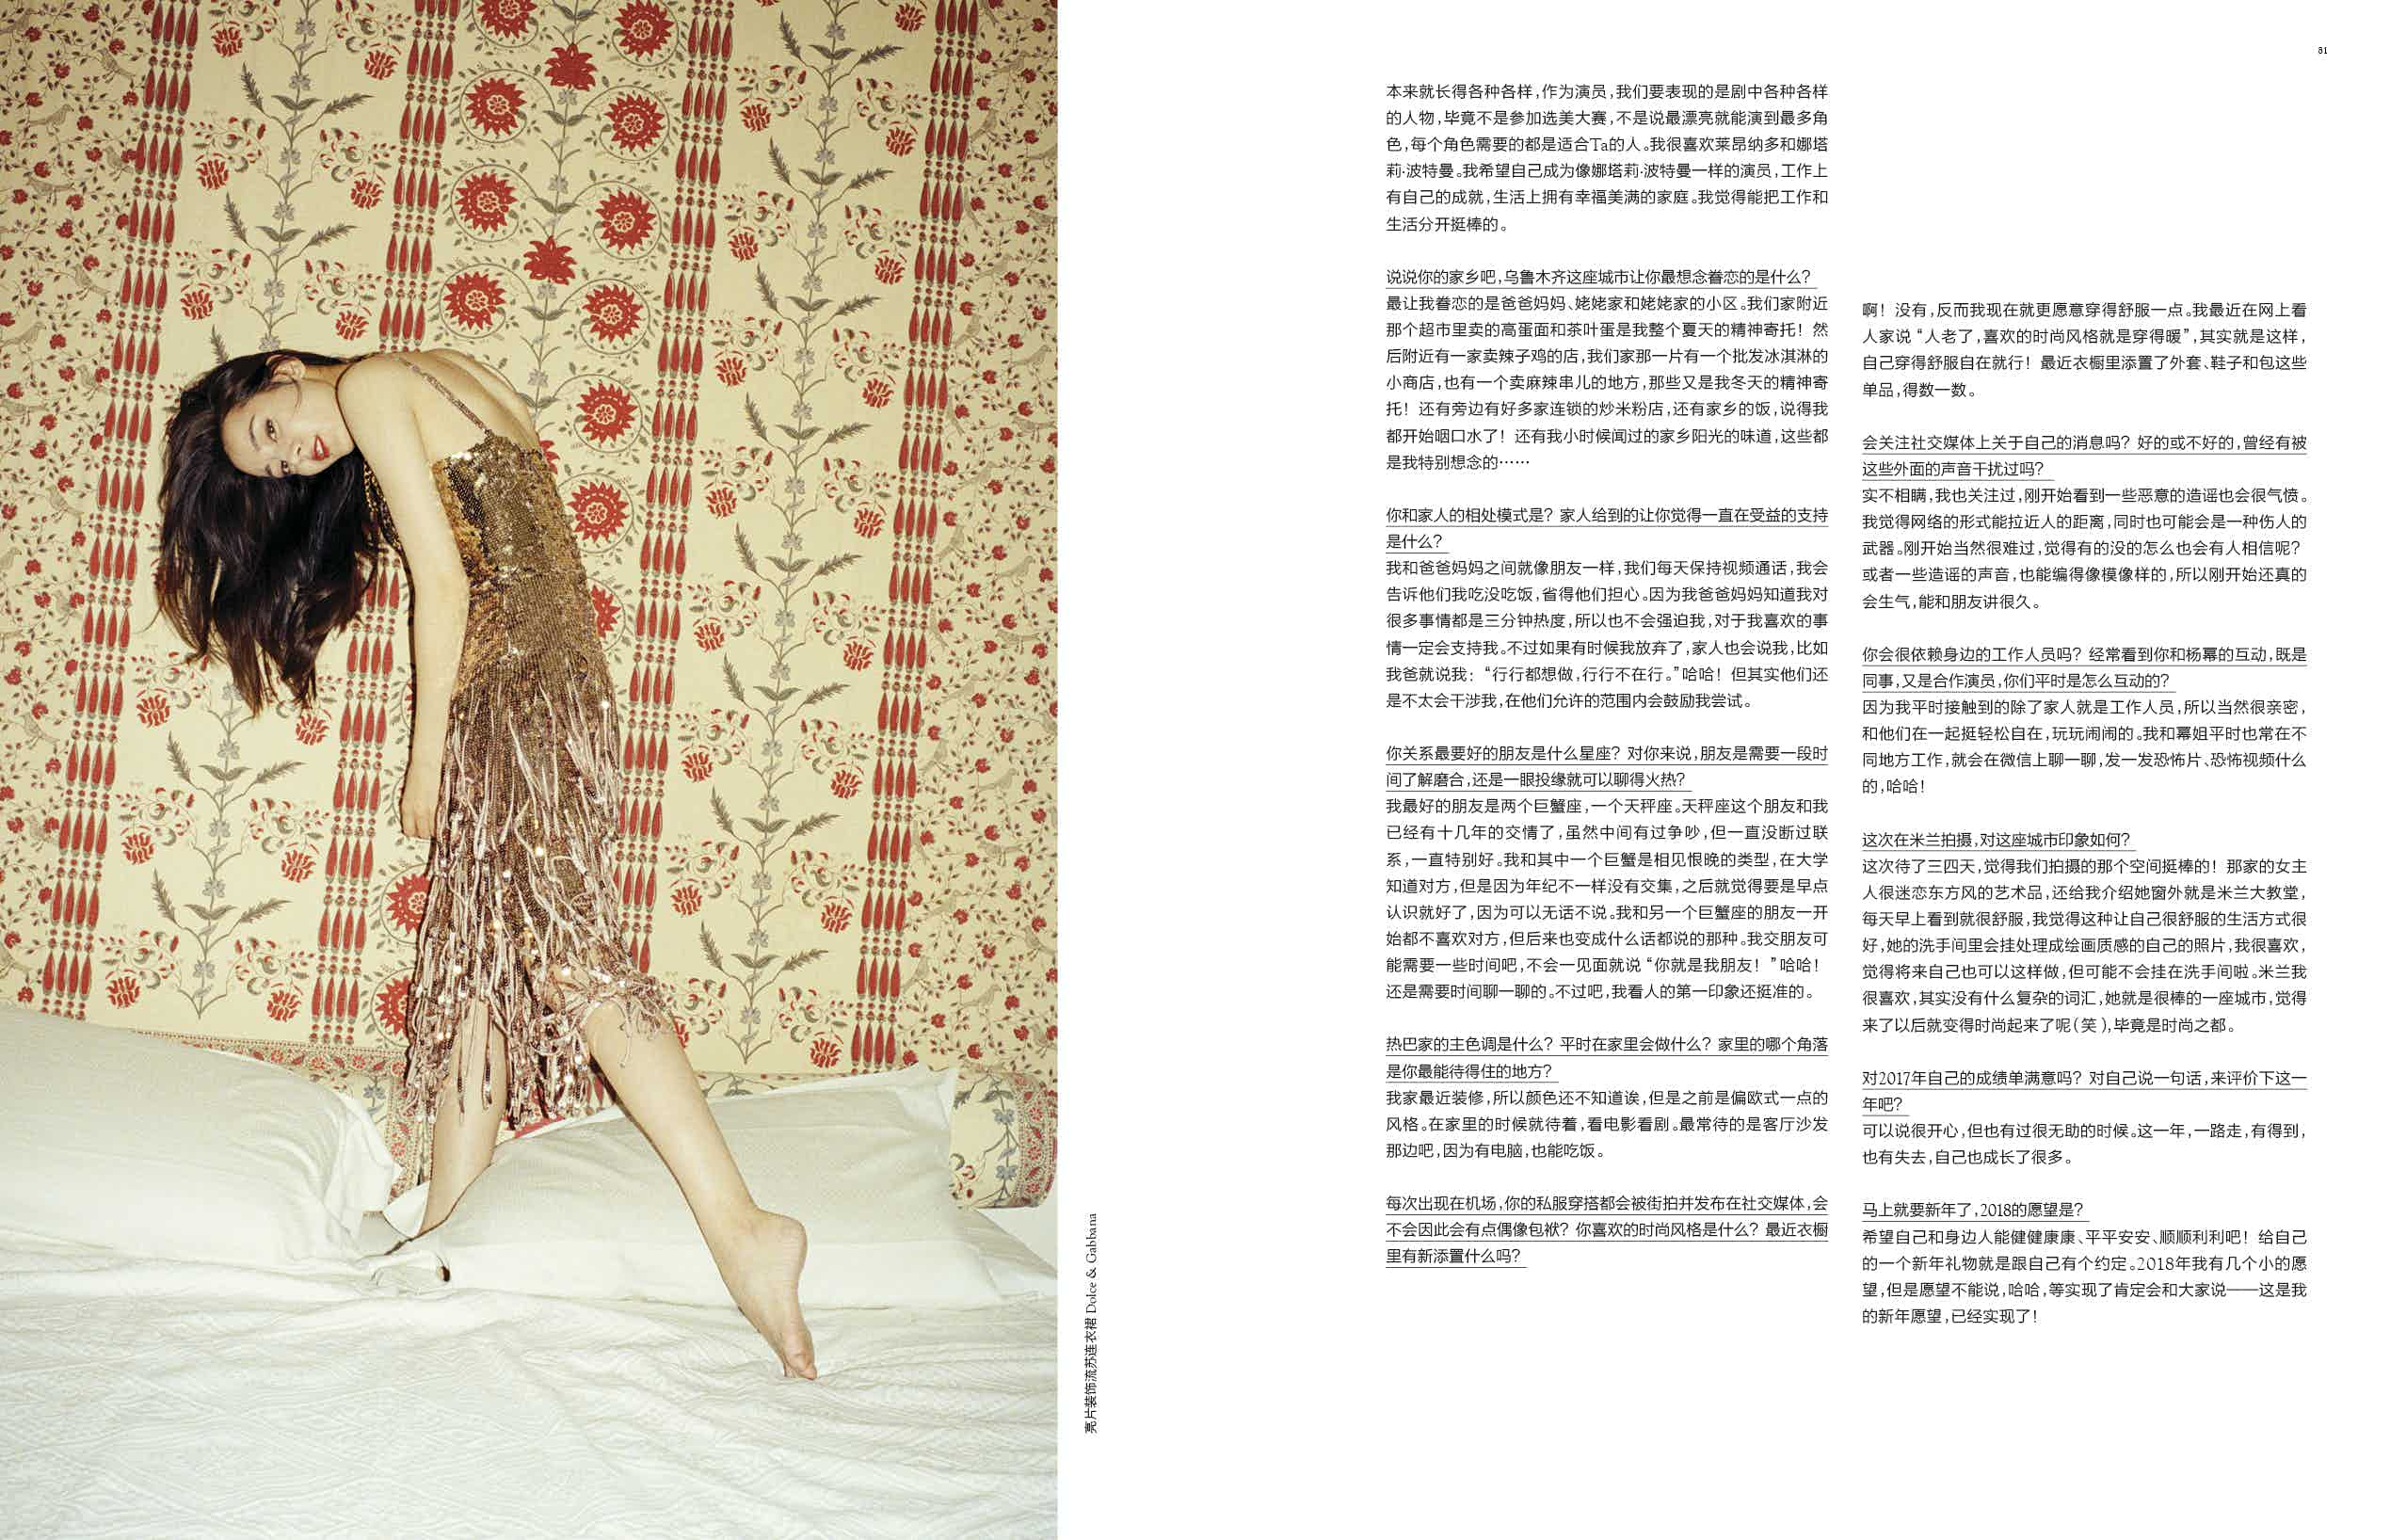 VOGUE CHINA - Vogue Me December 2017 Photographer: Xiangyu Liu Model: Dilireba Stylist: Austin Wang Location: Milan, Italy